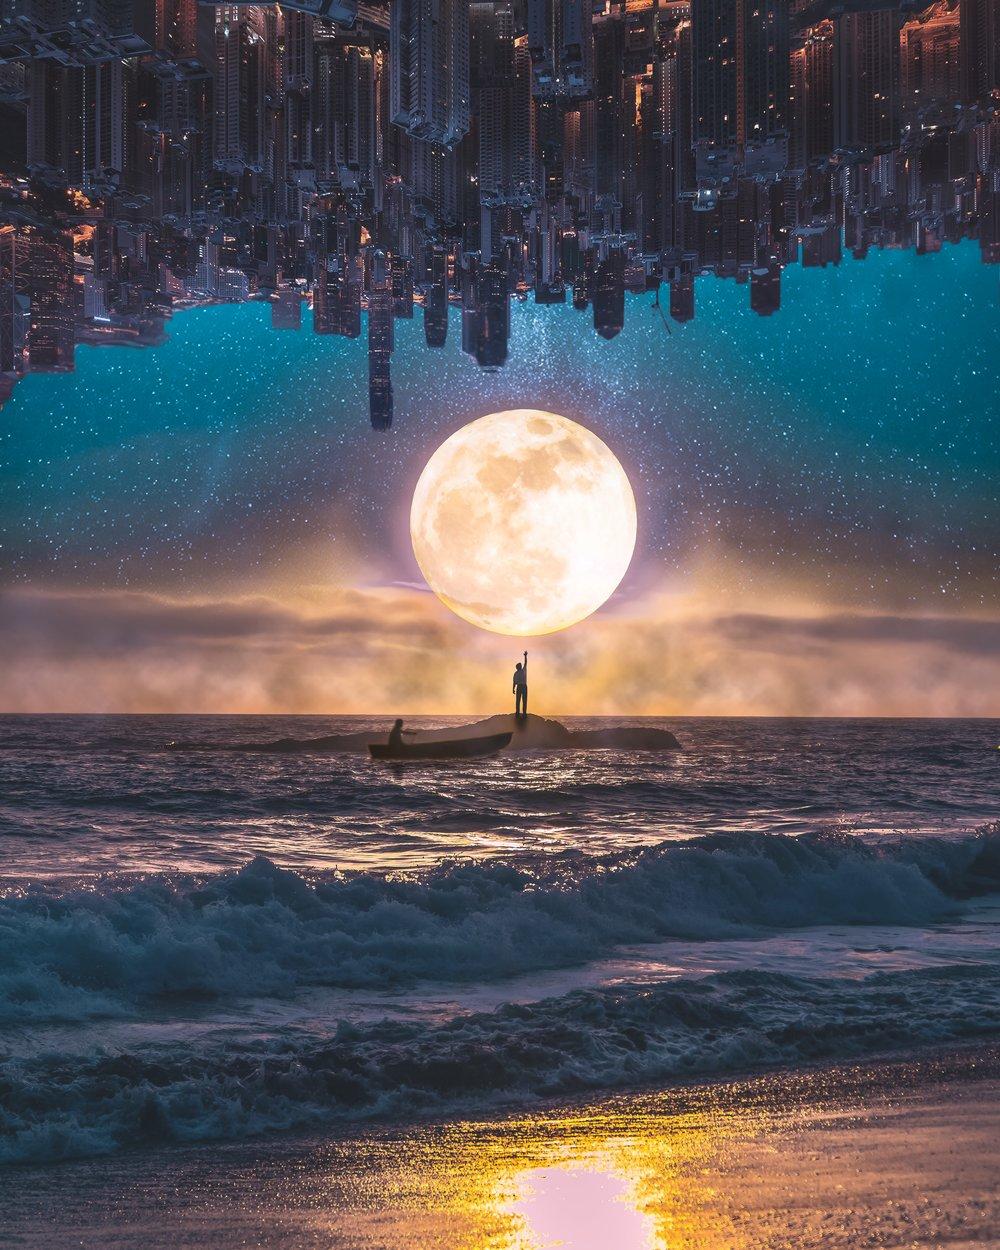 Dream World - by Brian Dao